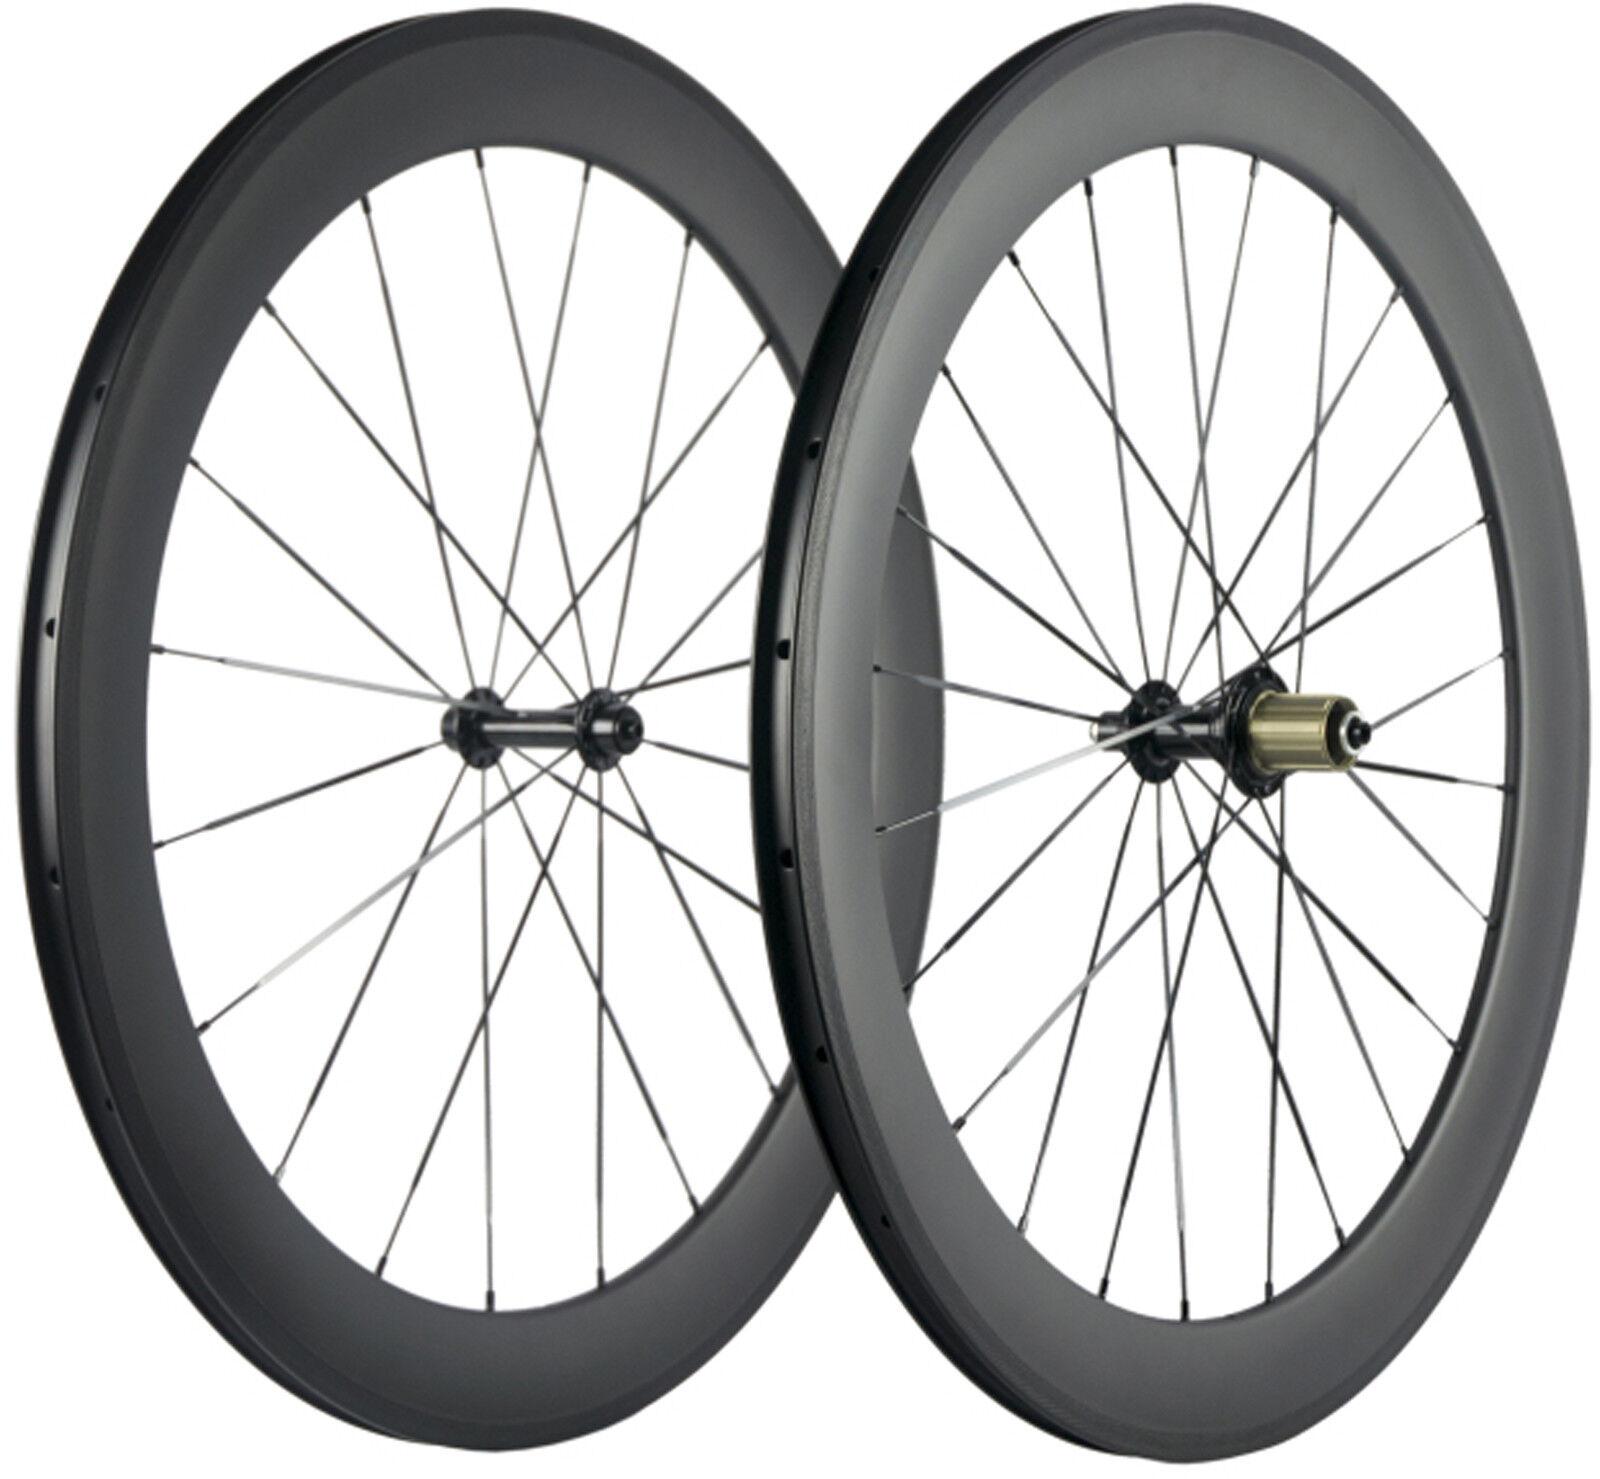 60mm  Depth Clincher Full Farbon Wheels Road Bike Bicycle Wheelset UD Matte 700C  shop online